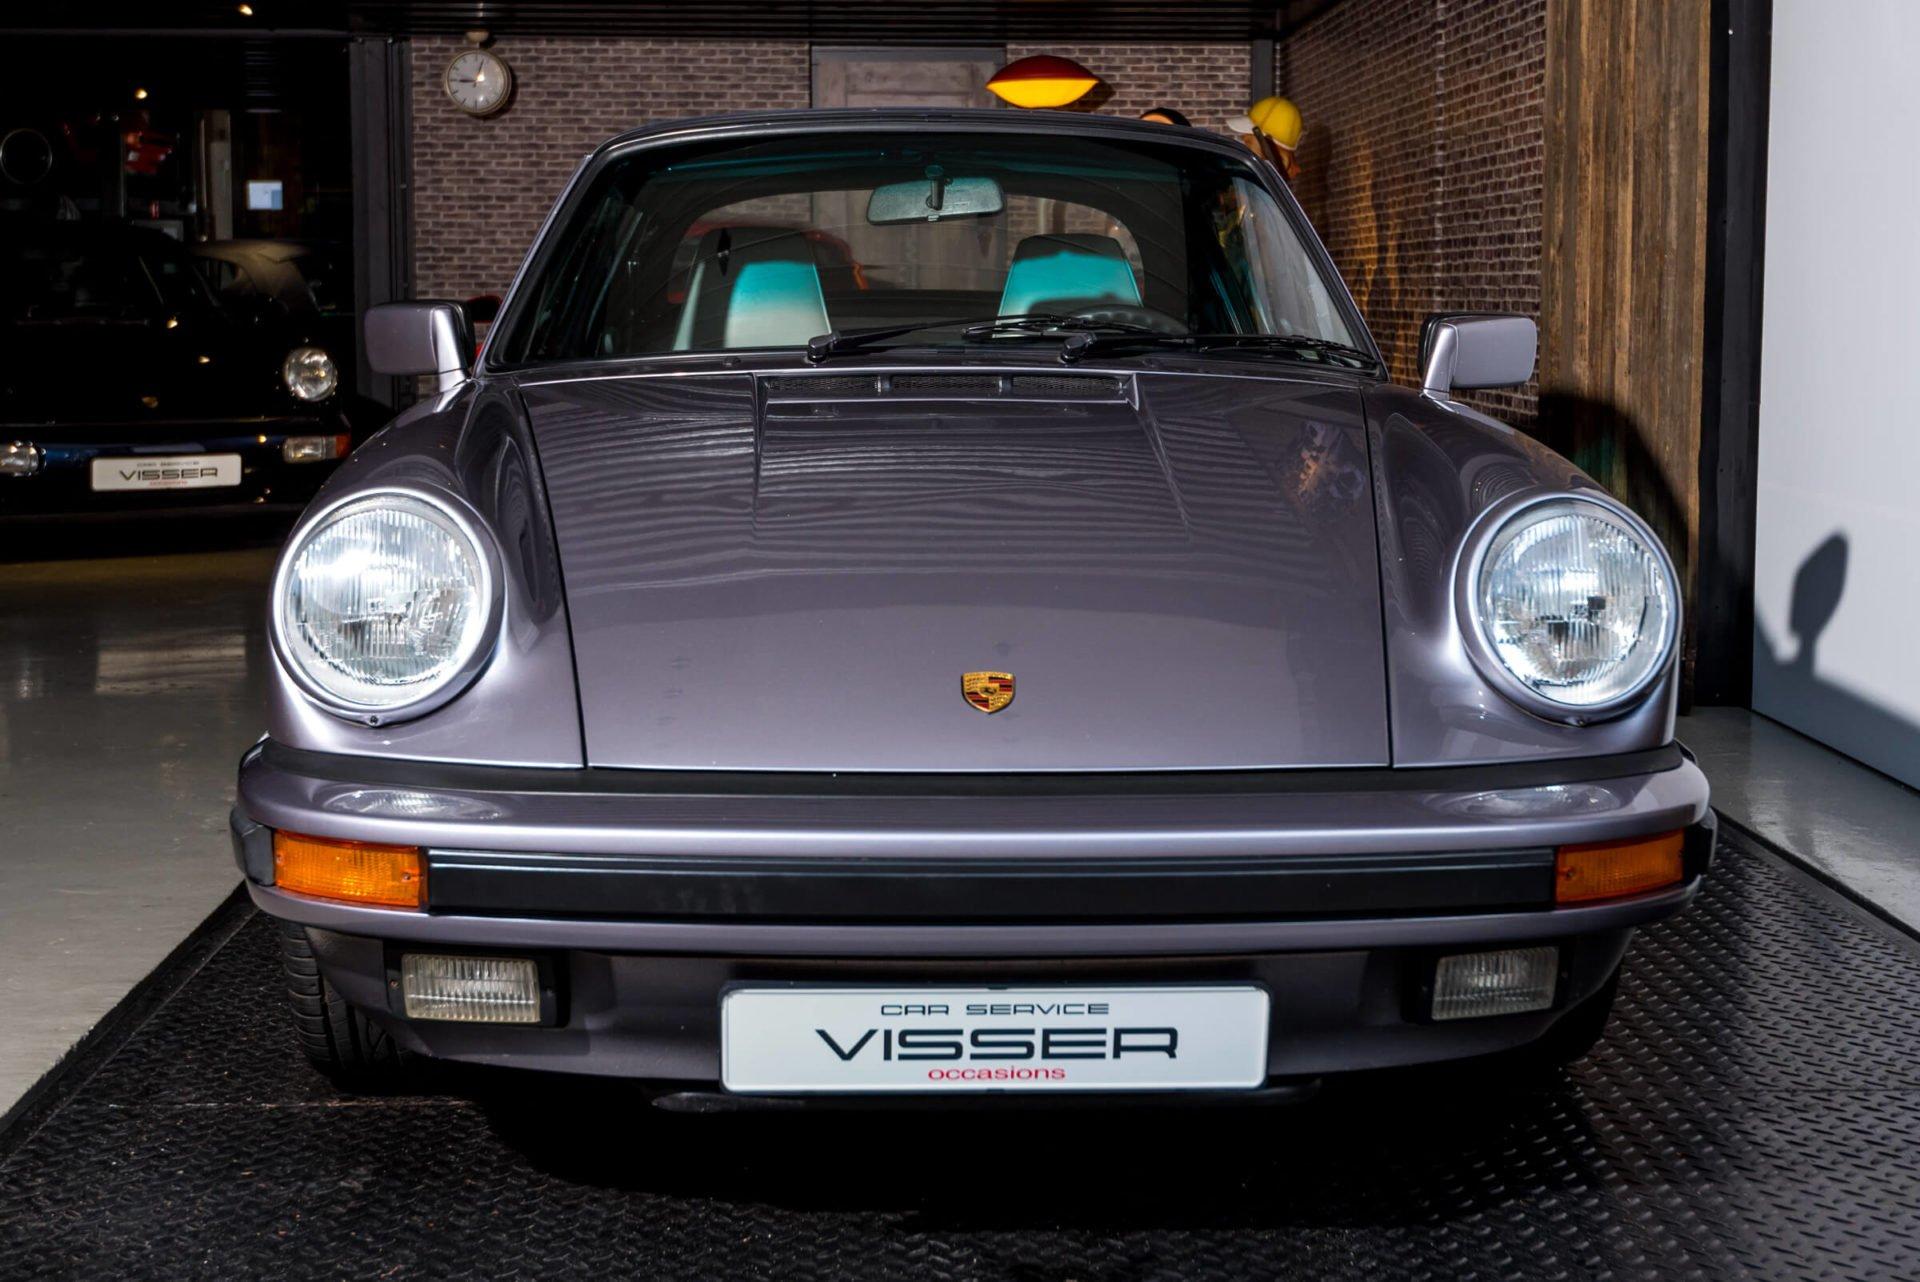 1. Porsche 3.2 Carrera 4